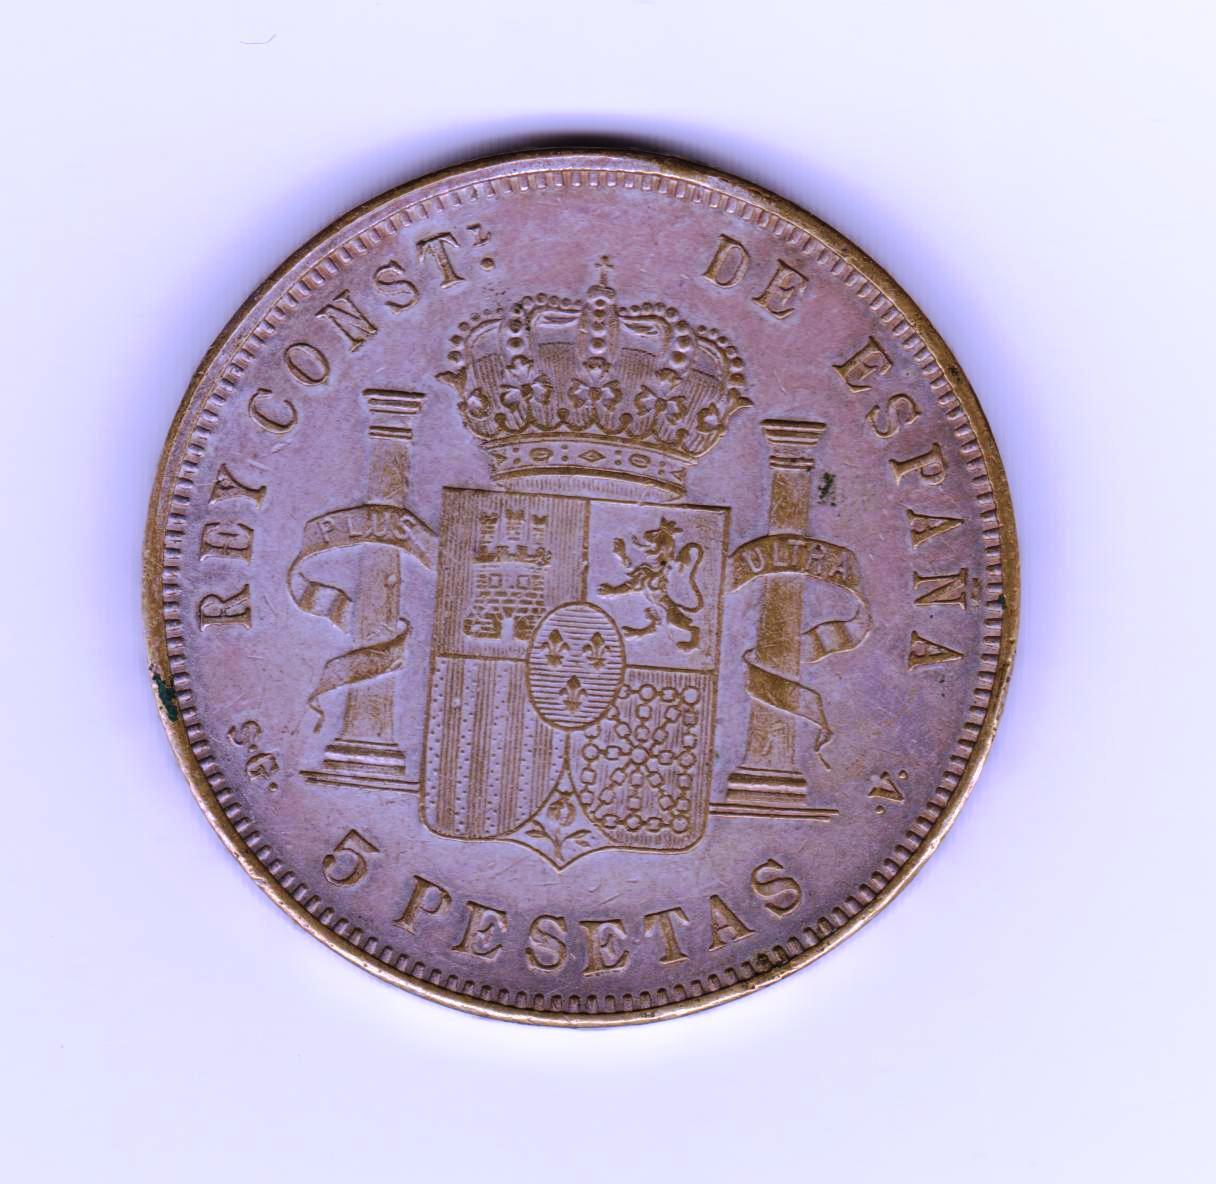 5 pesetas 1899, latón plateado 5_pesetas_1899_falas_epoca_001